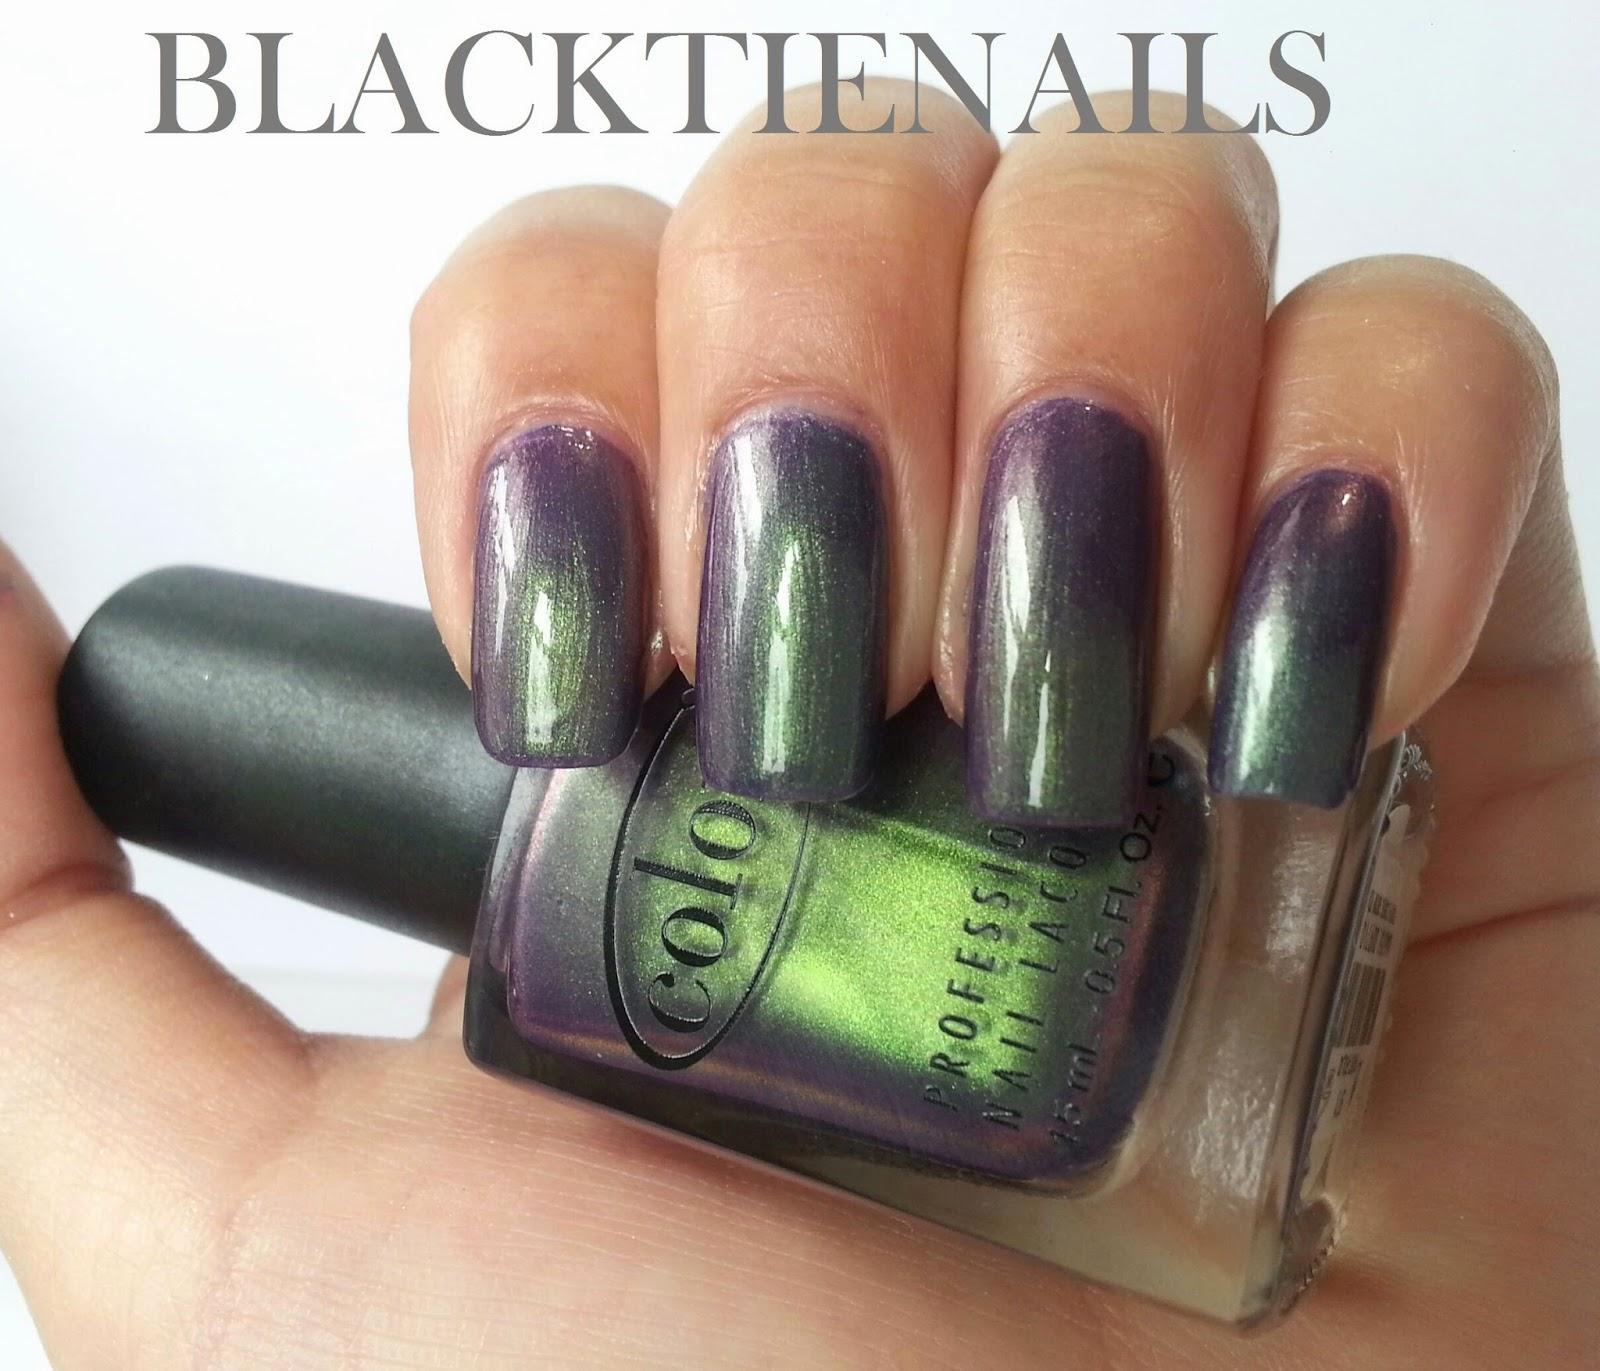 Black Heart Nail Polish: Black Tie Nails: Blackheart Beauty Nail Polish Swatches